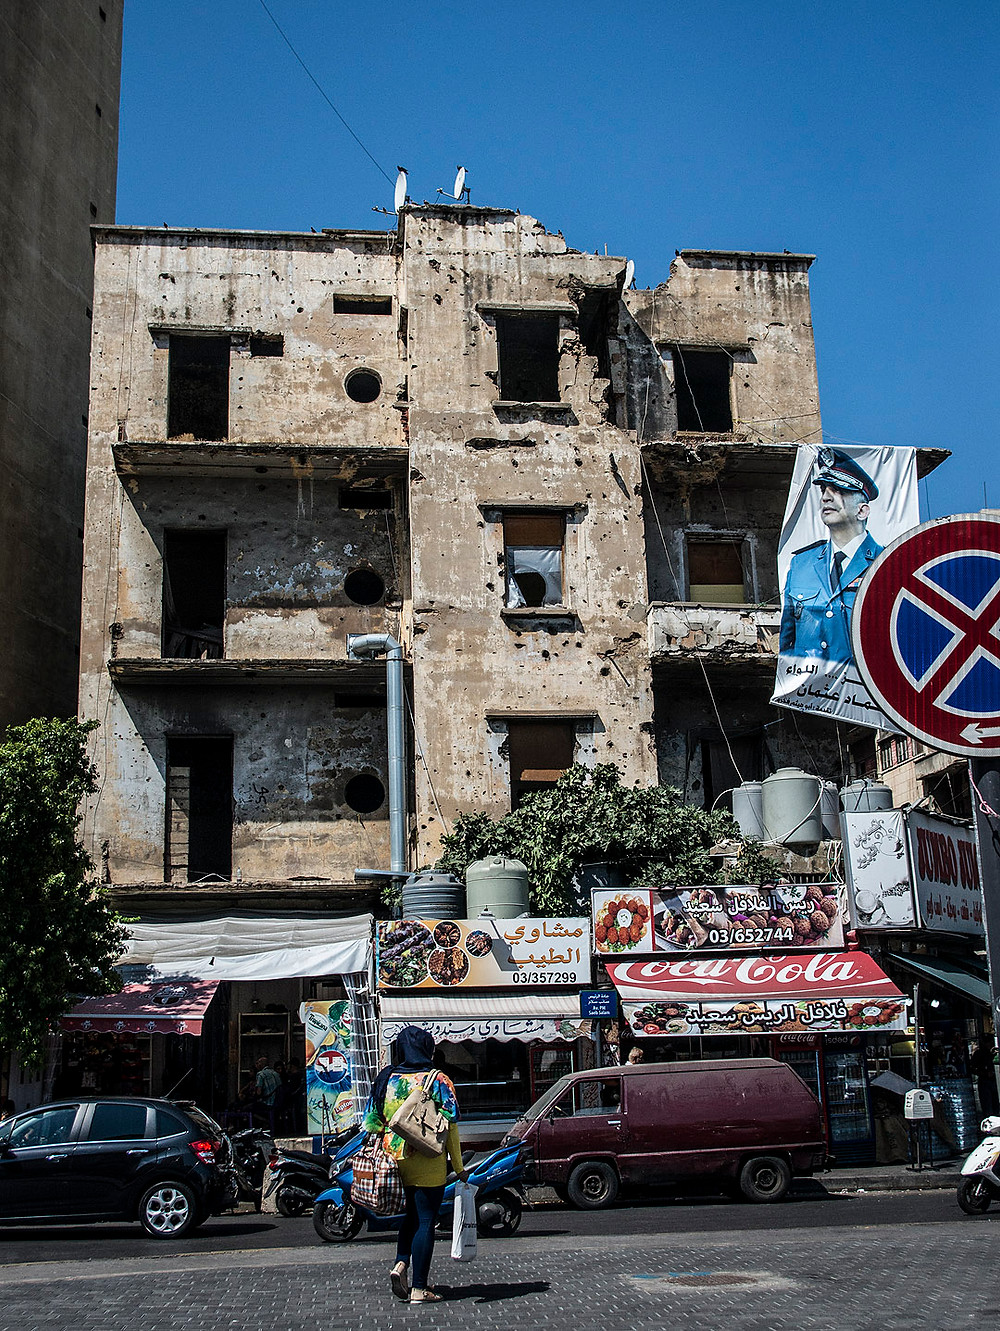 Damaged building in Beirut, Lebanon